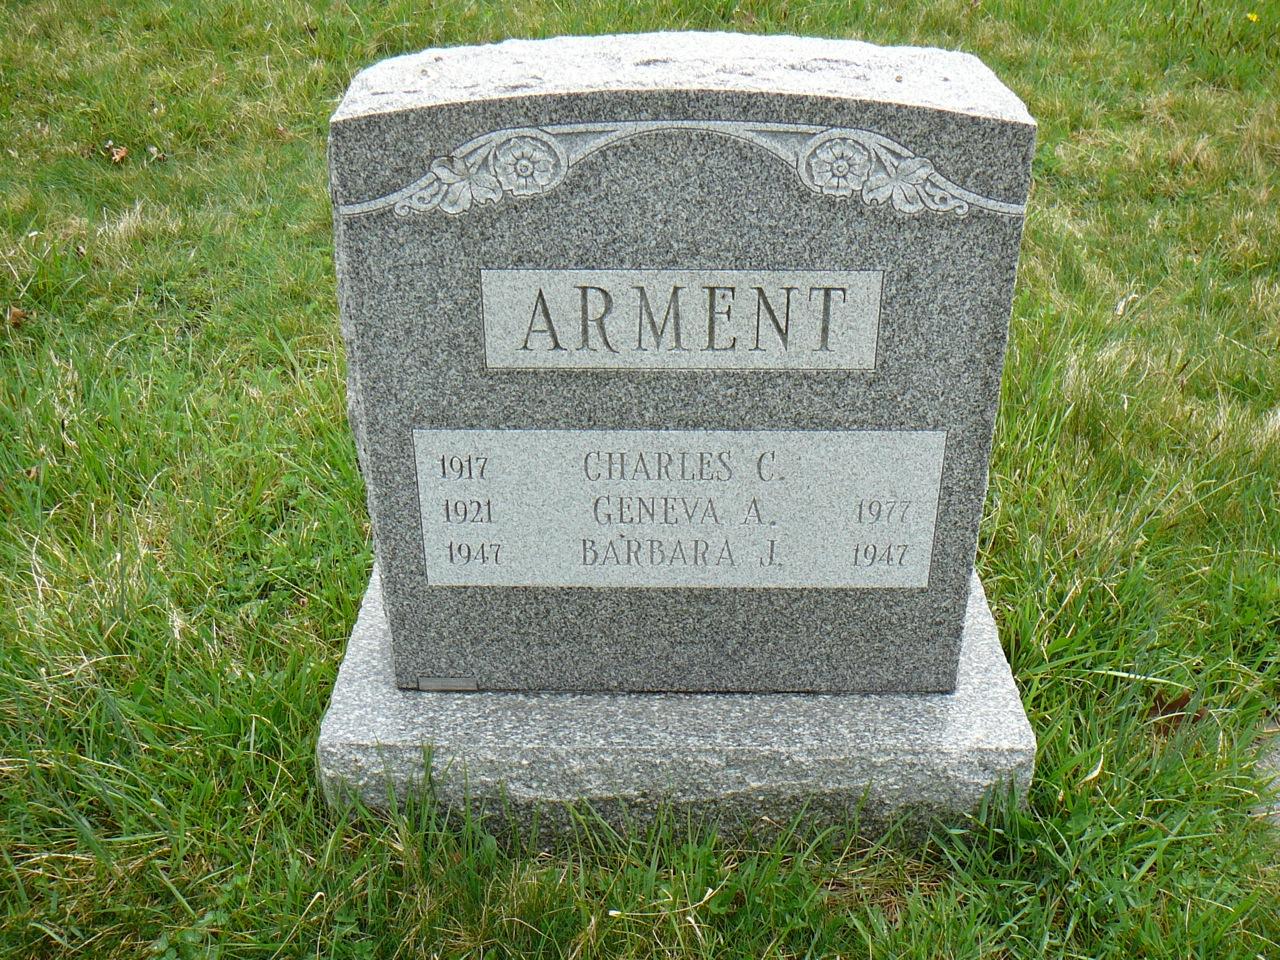 Barbara J. Arment